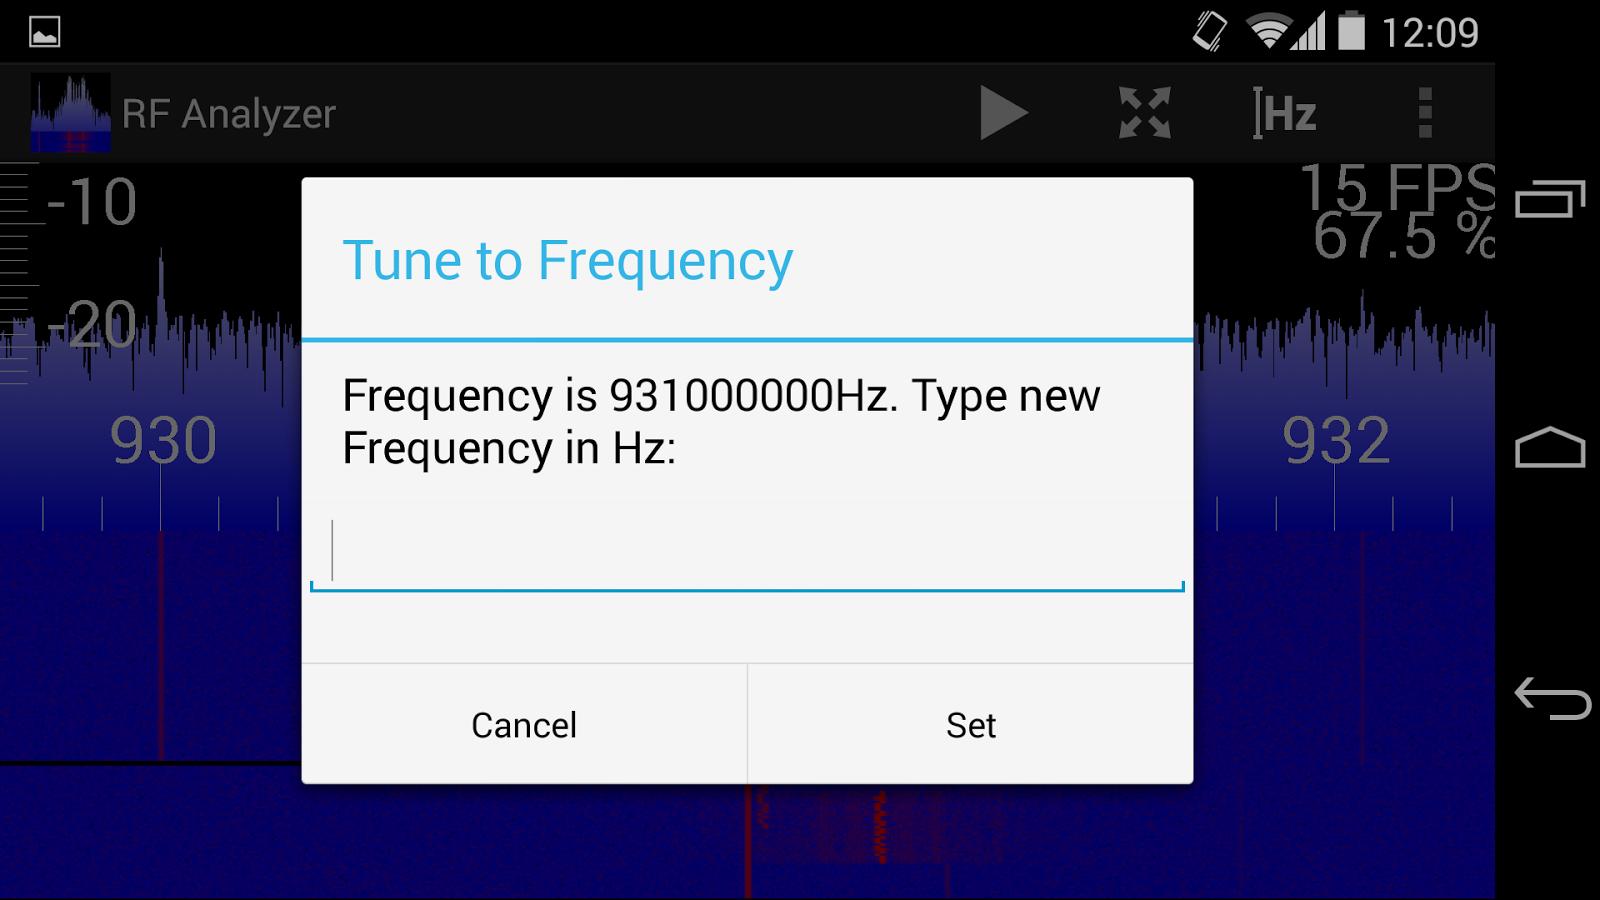 Mantz Tech: RF Analyzer - Explore the frequency spectrum